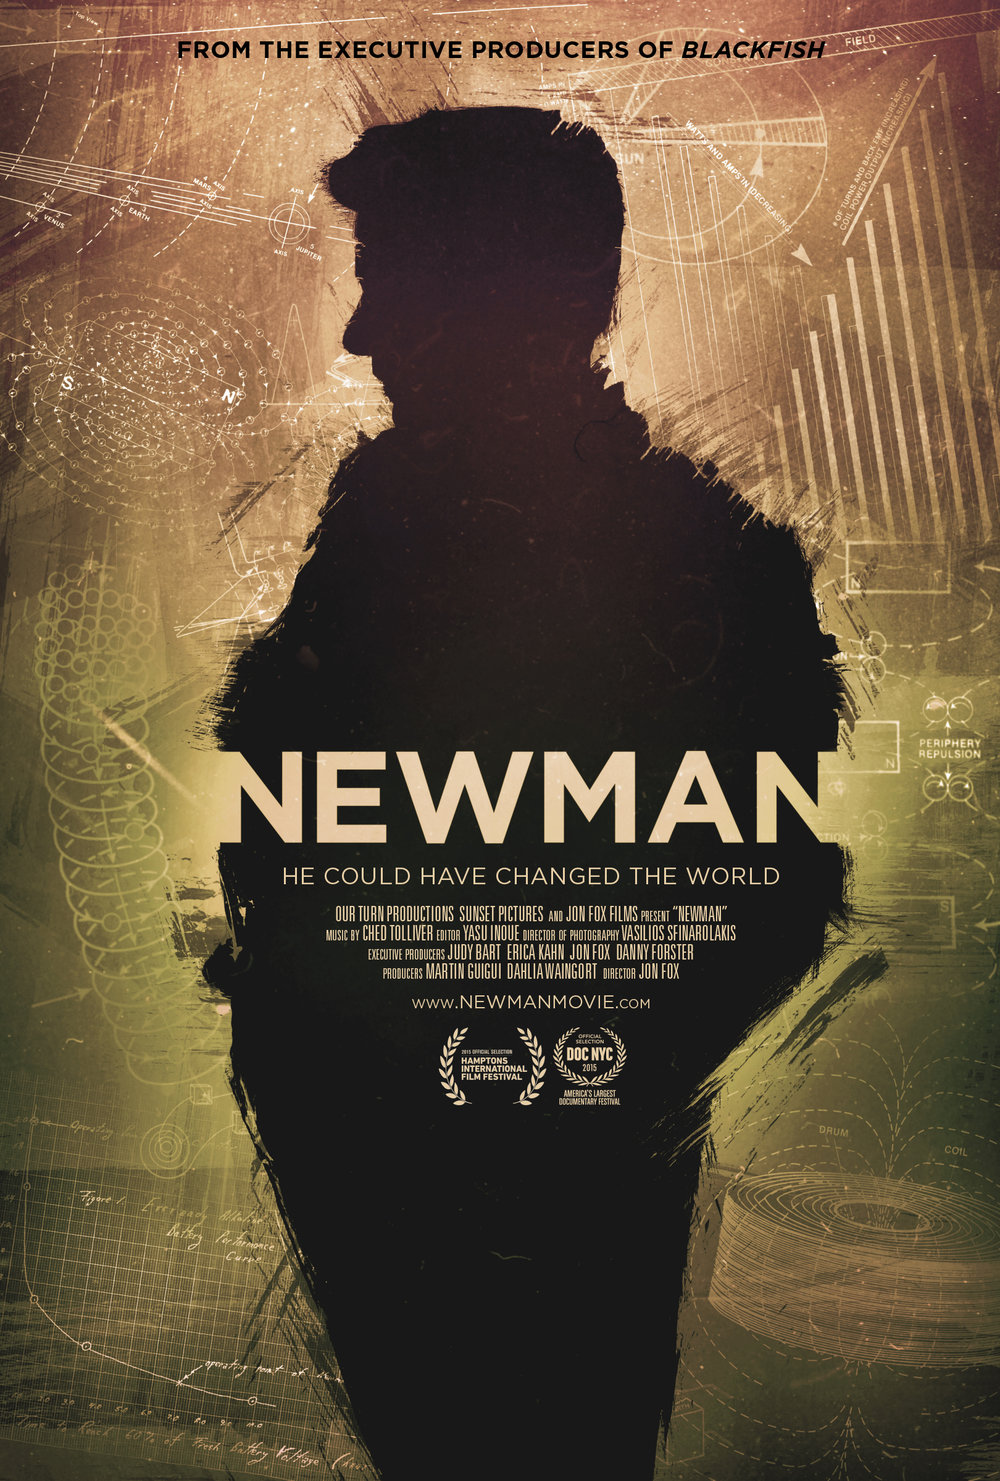 newman_poster-101315_22468592134_o.jpg